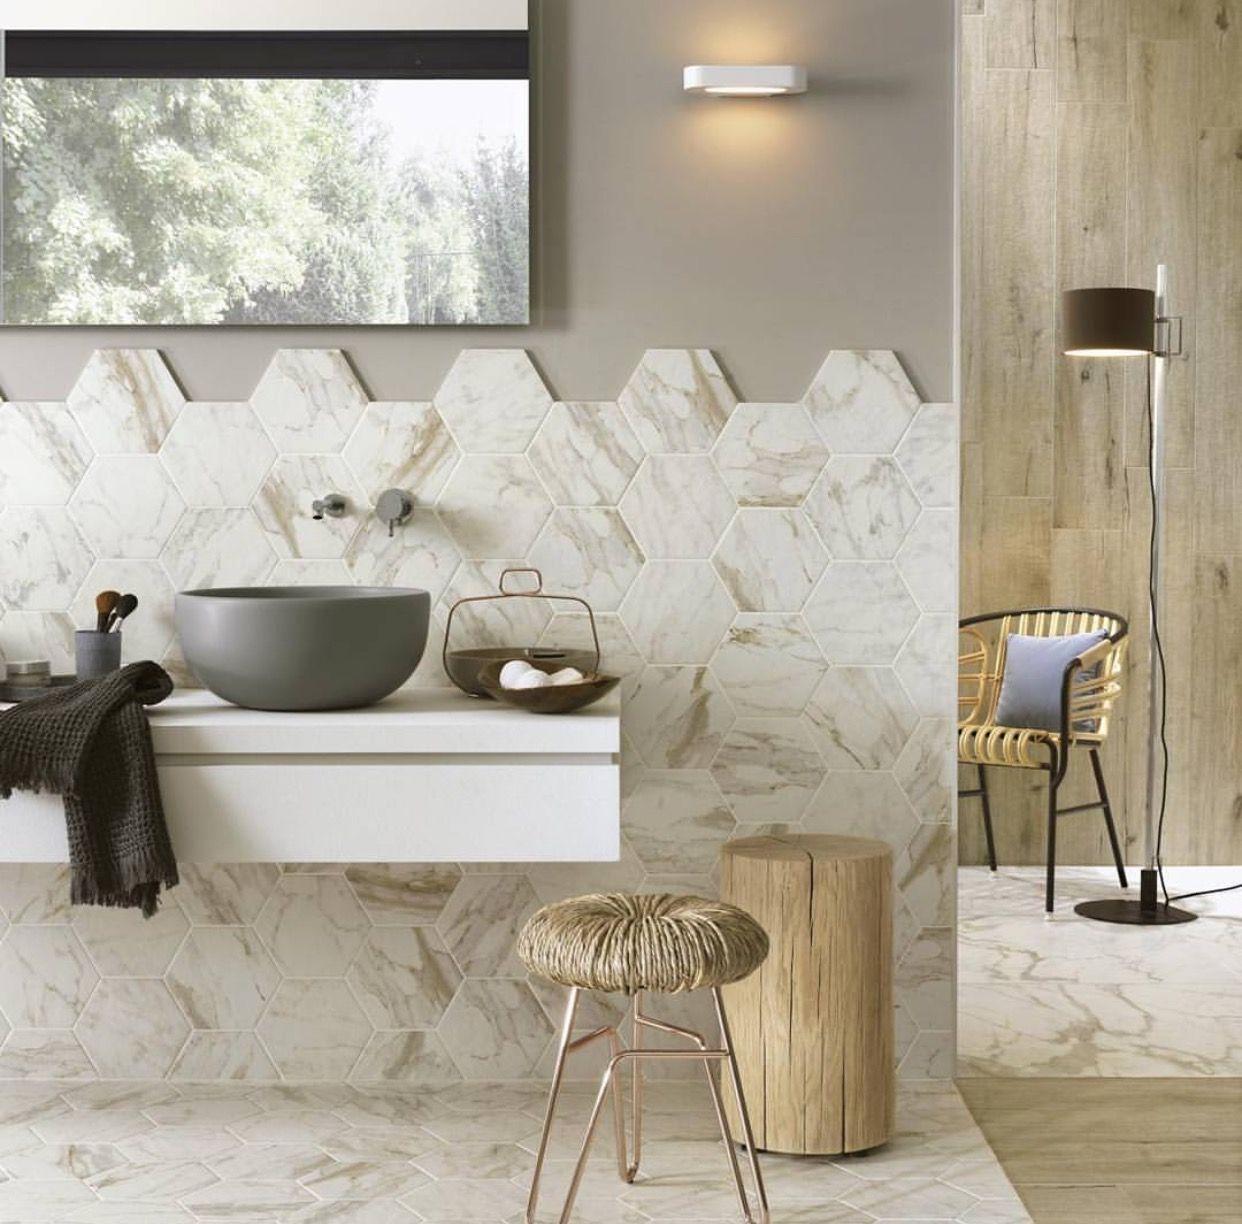 The Art Gallery Ciotola da appoggio Shui collection by Cielo washbasin design bathroom colour